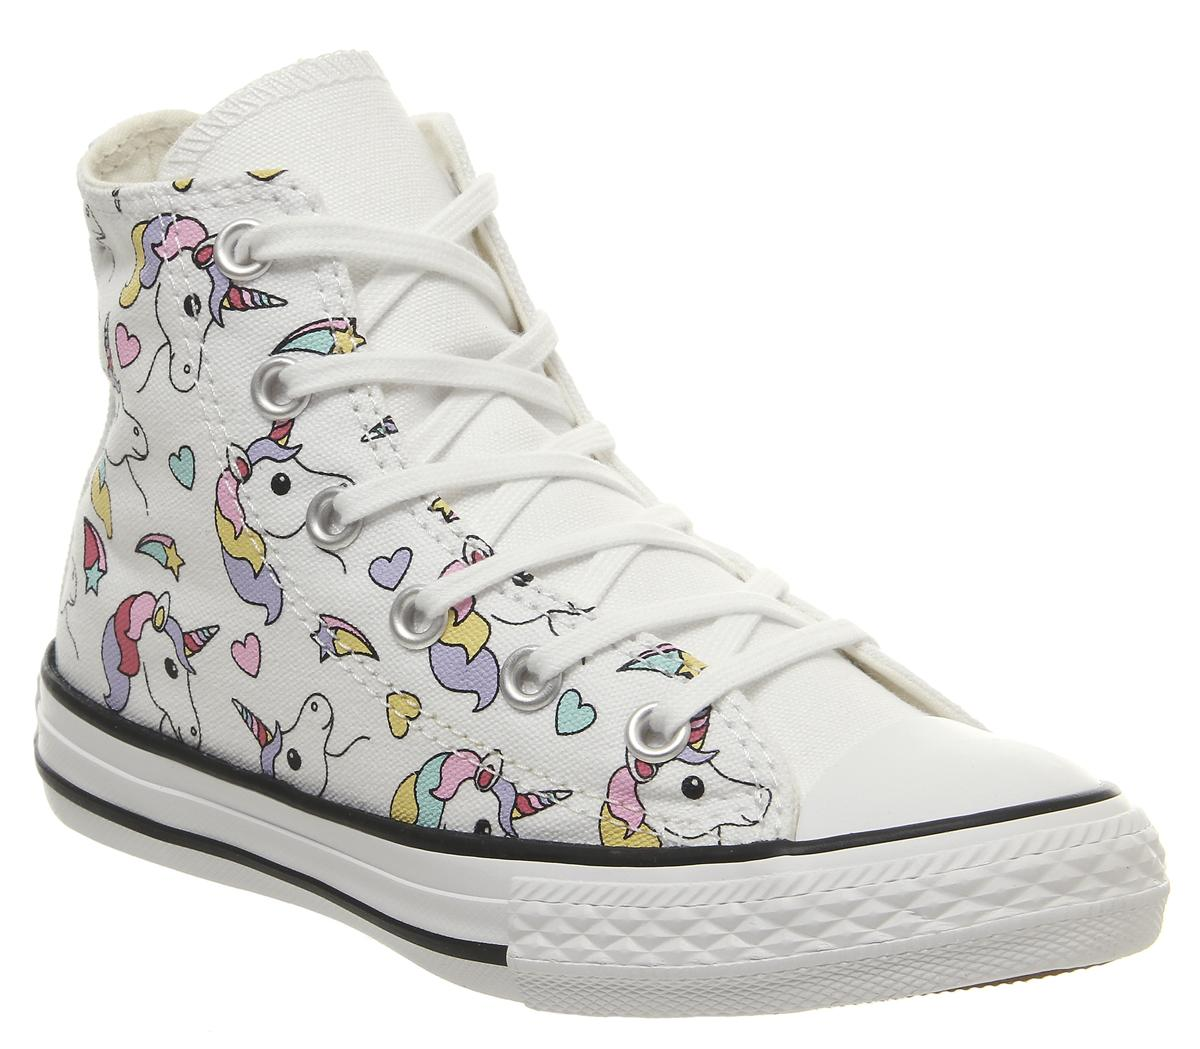 unicorn converse Online Shopping for Women, Men, Kids Fashion ...